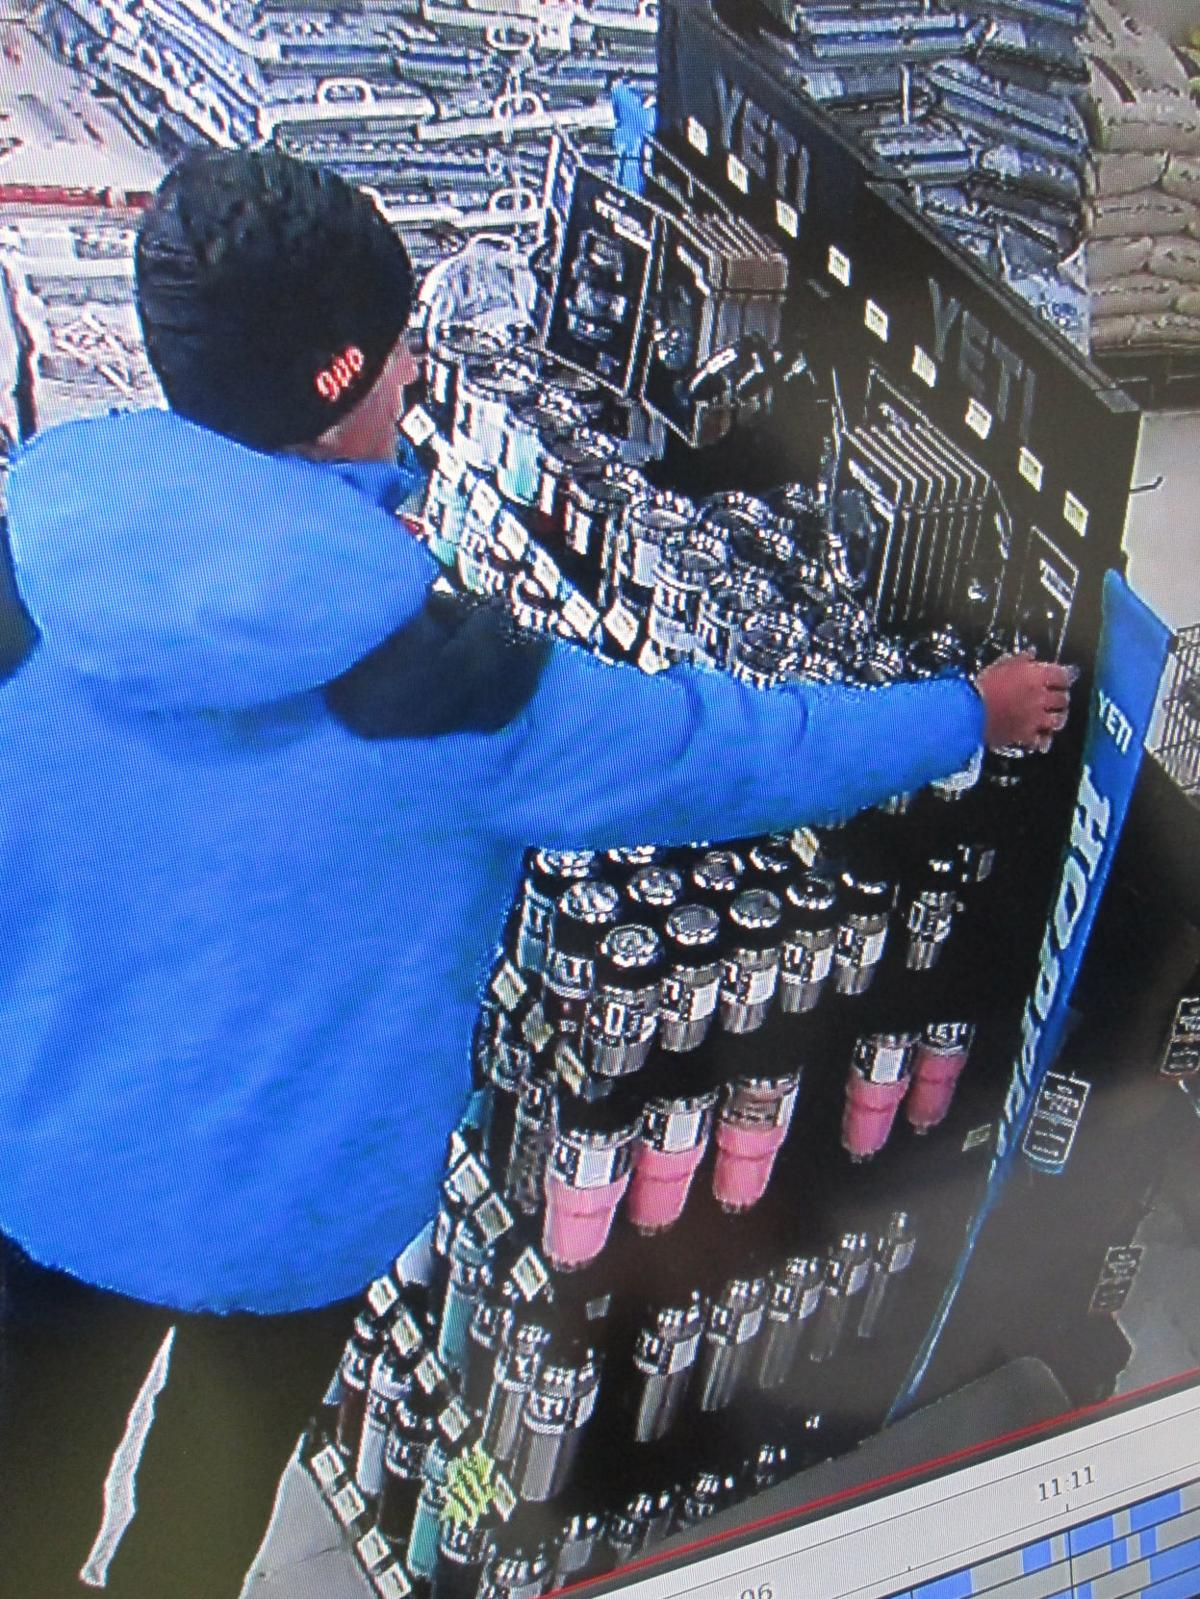 Sauk County Board to consider rebuke of supervisor who shoplifted (copy)